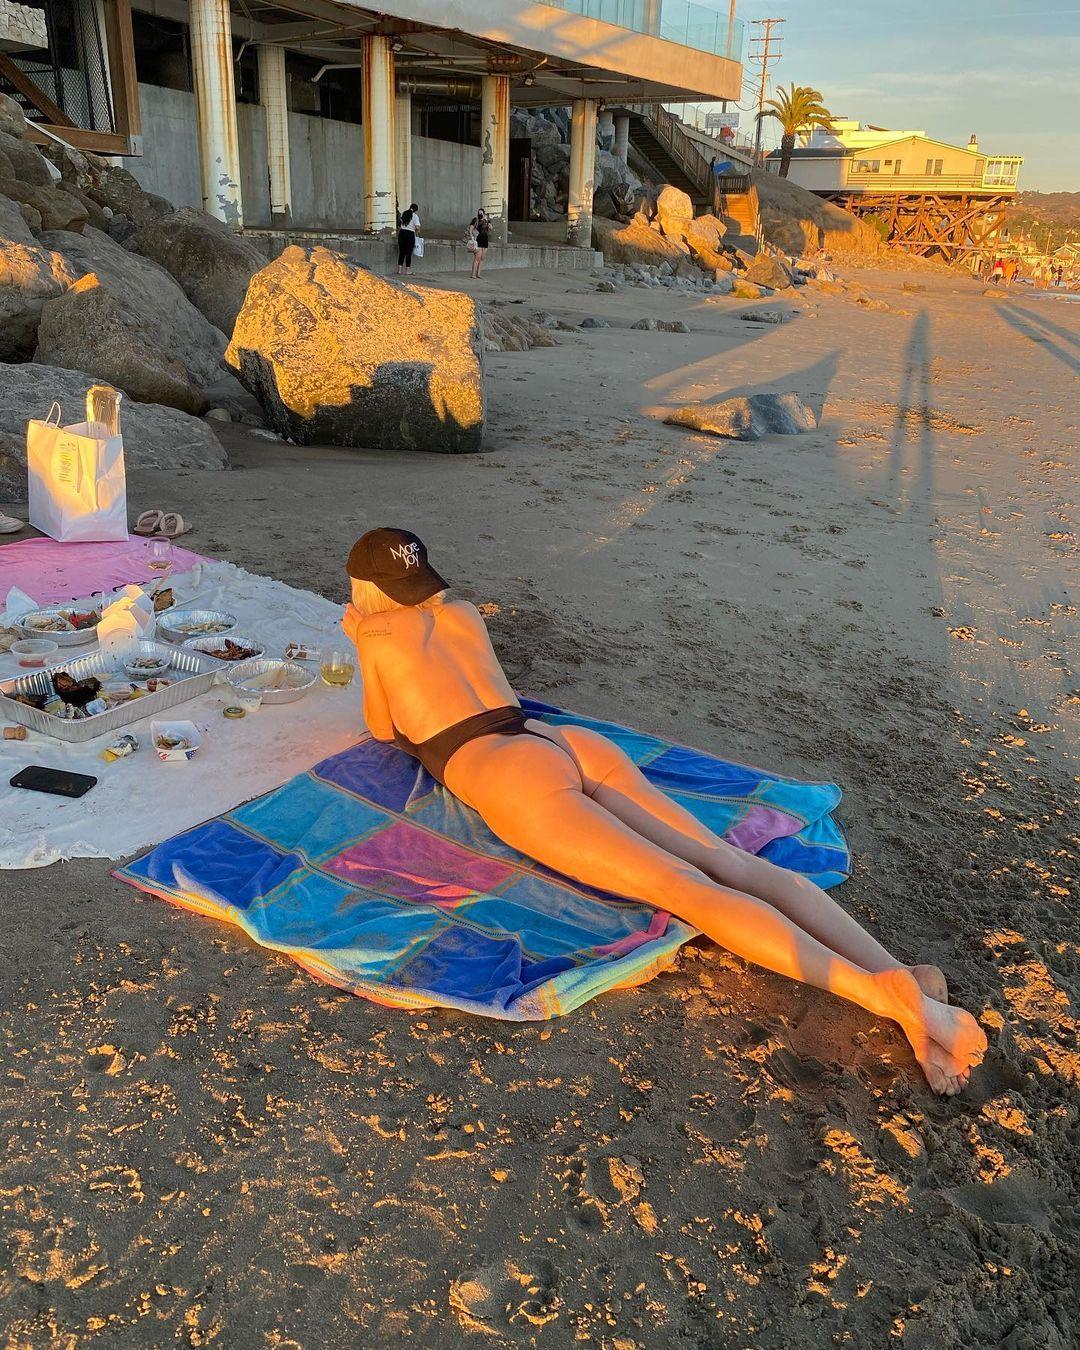 Caroline Vreeland Sexy Swimsuit